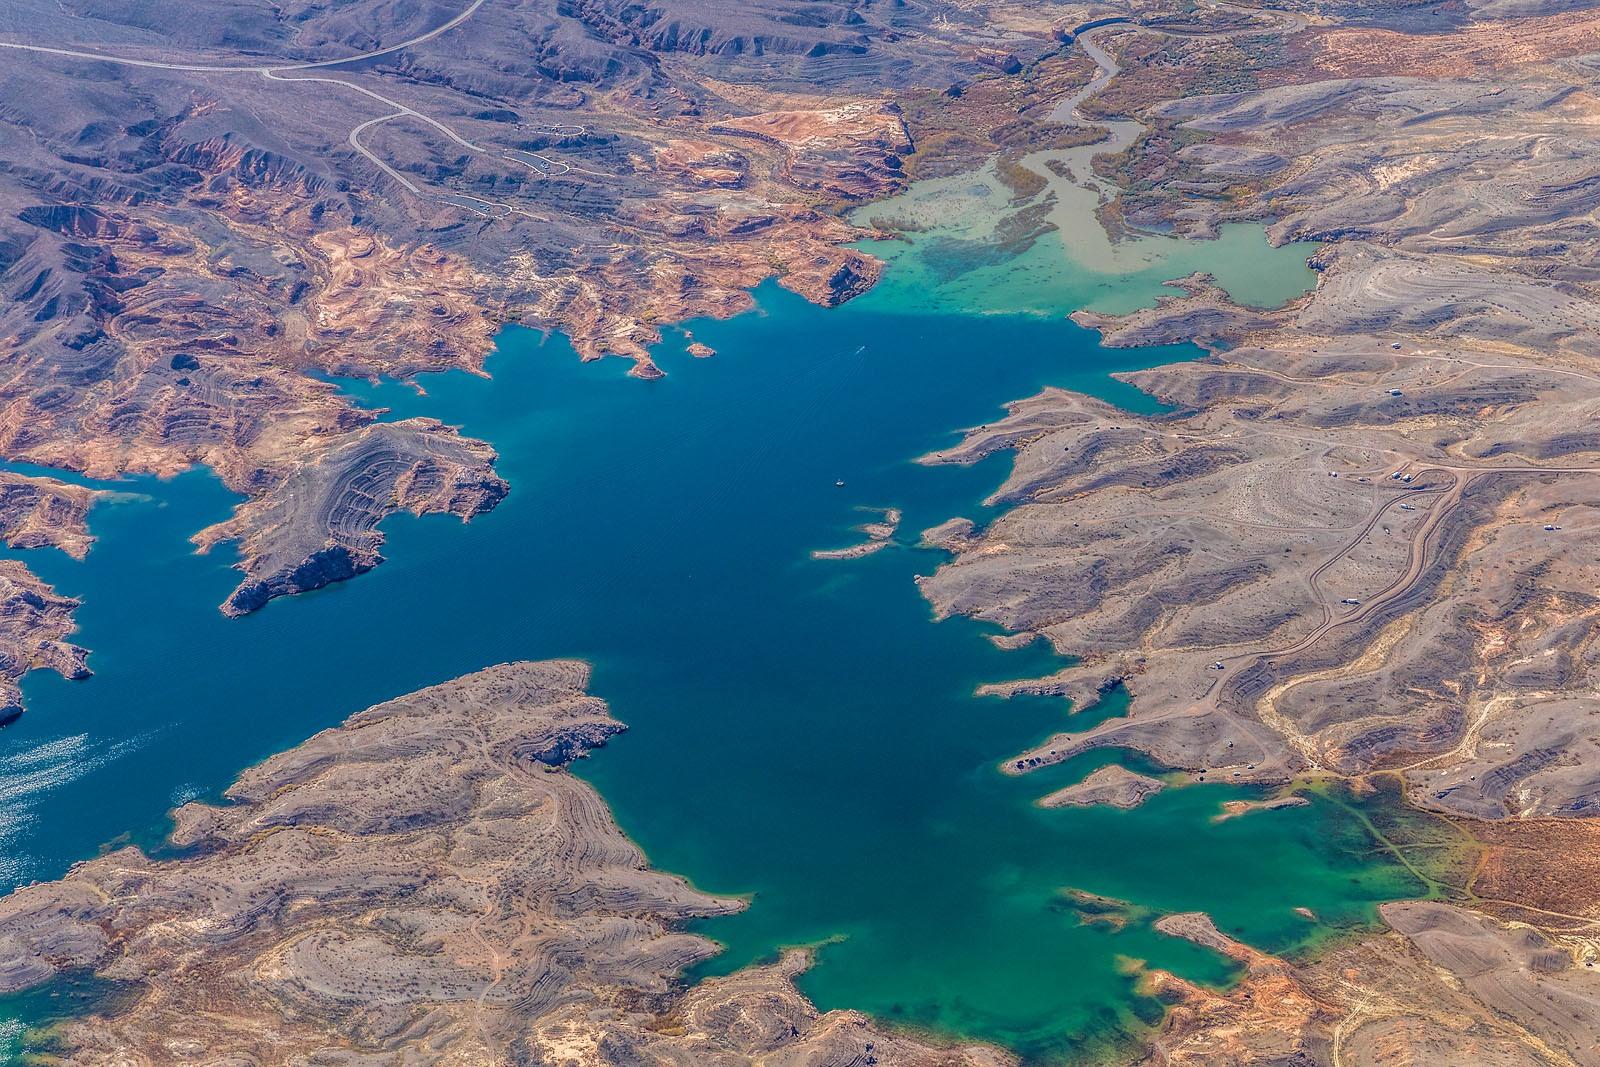 Lake Mead Aerial Landscape MG_7672